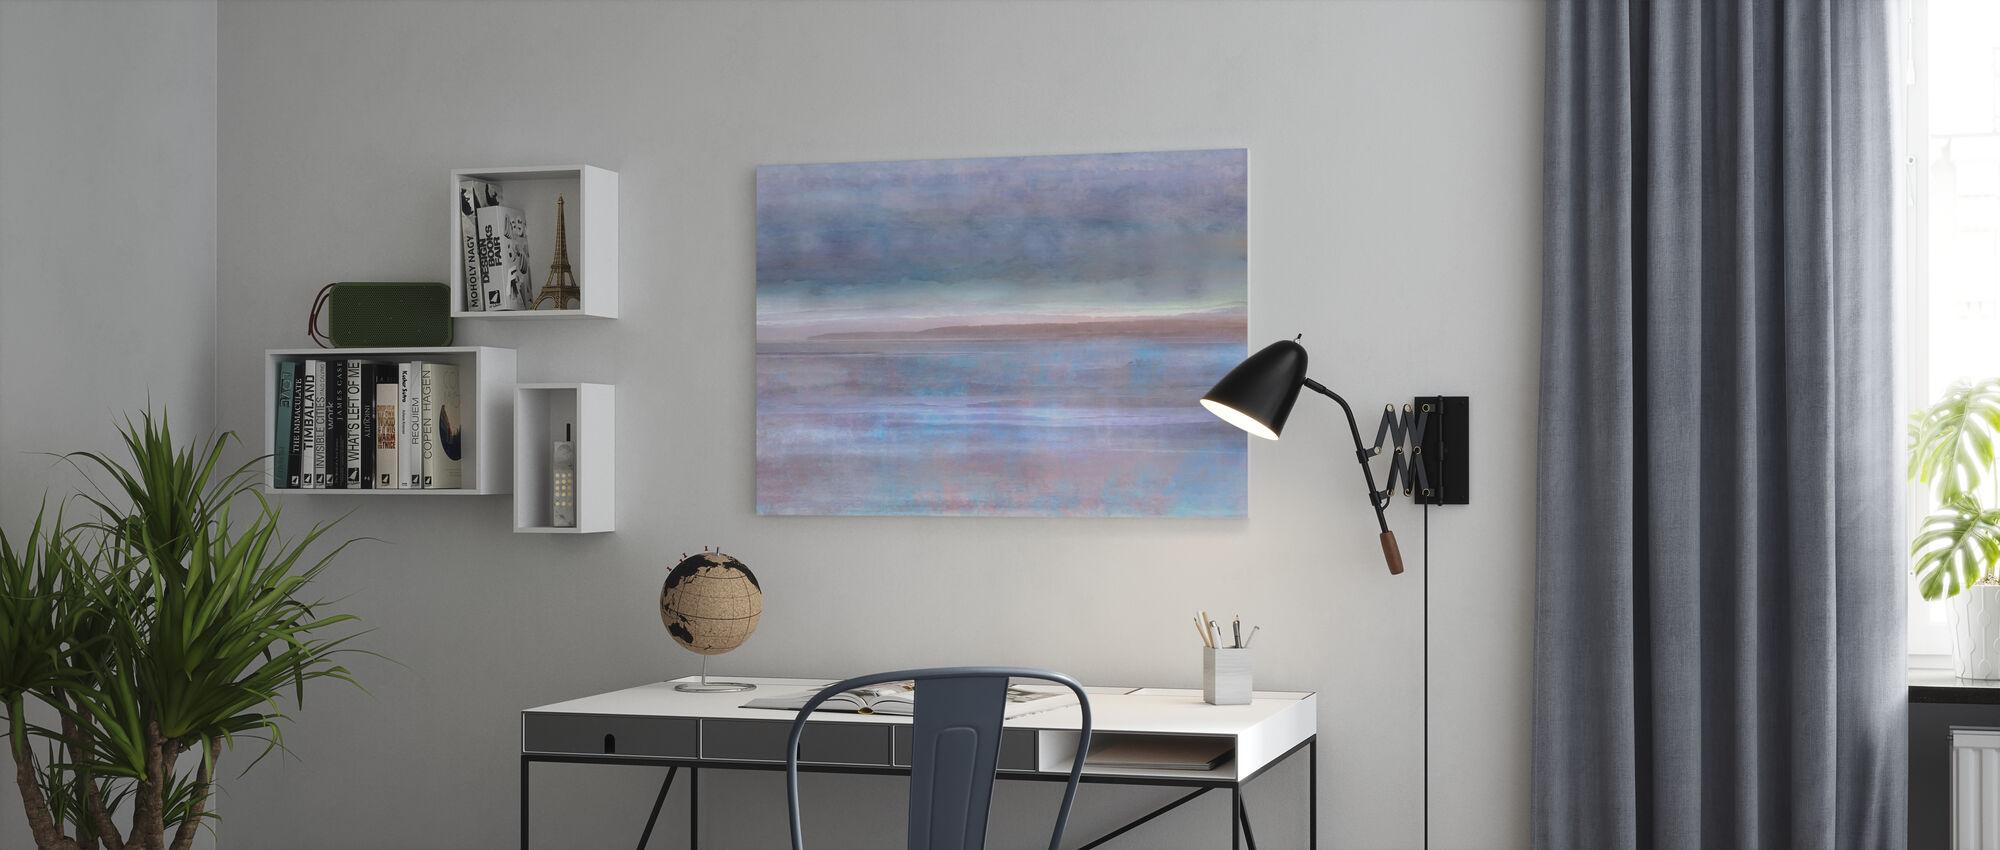 Tidal Flat - Canvas print - Office